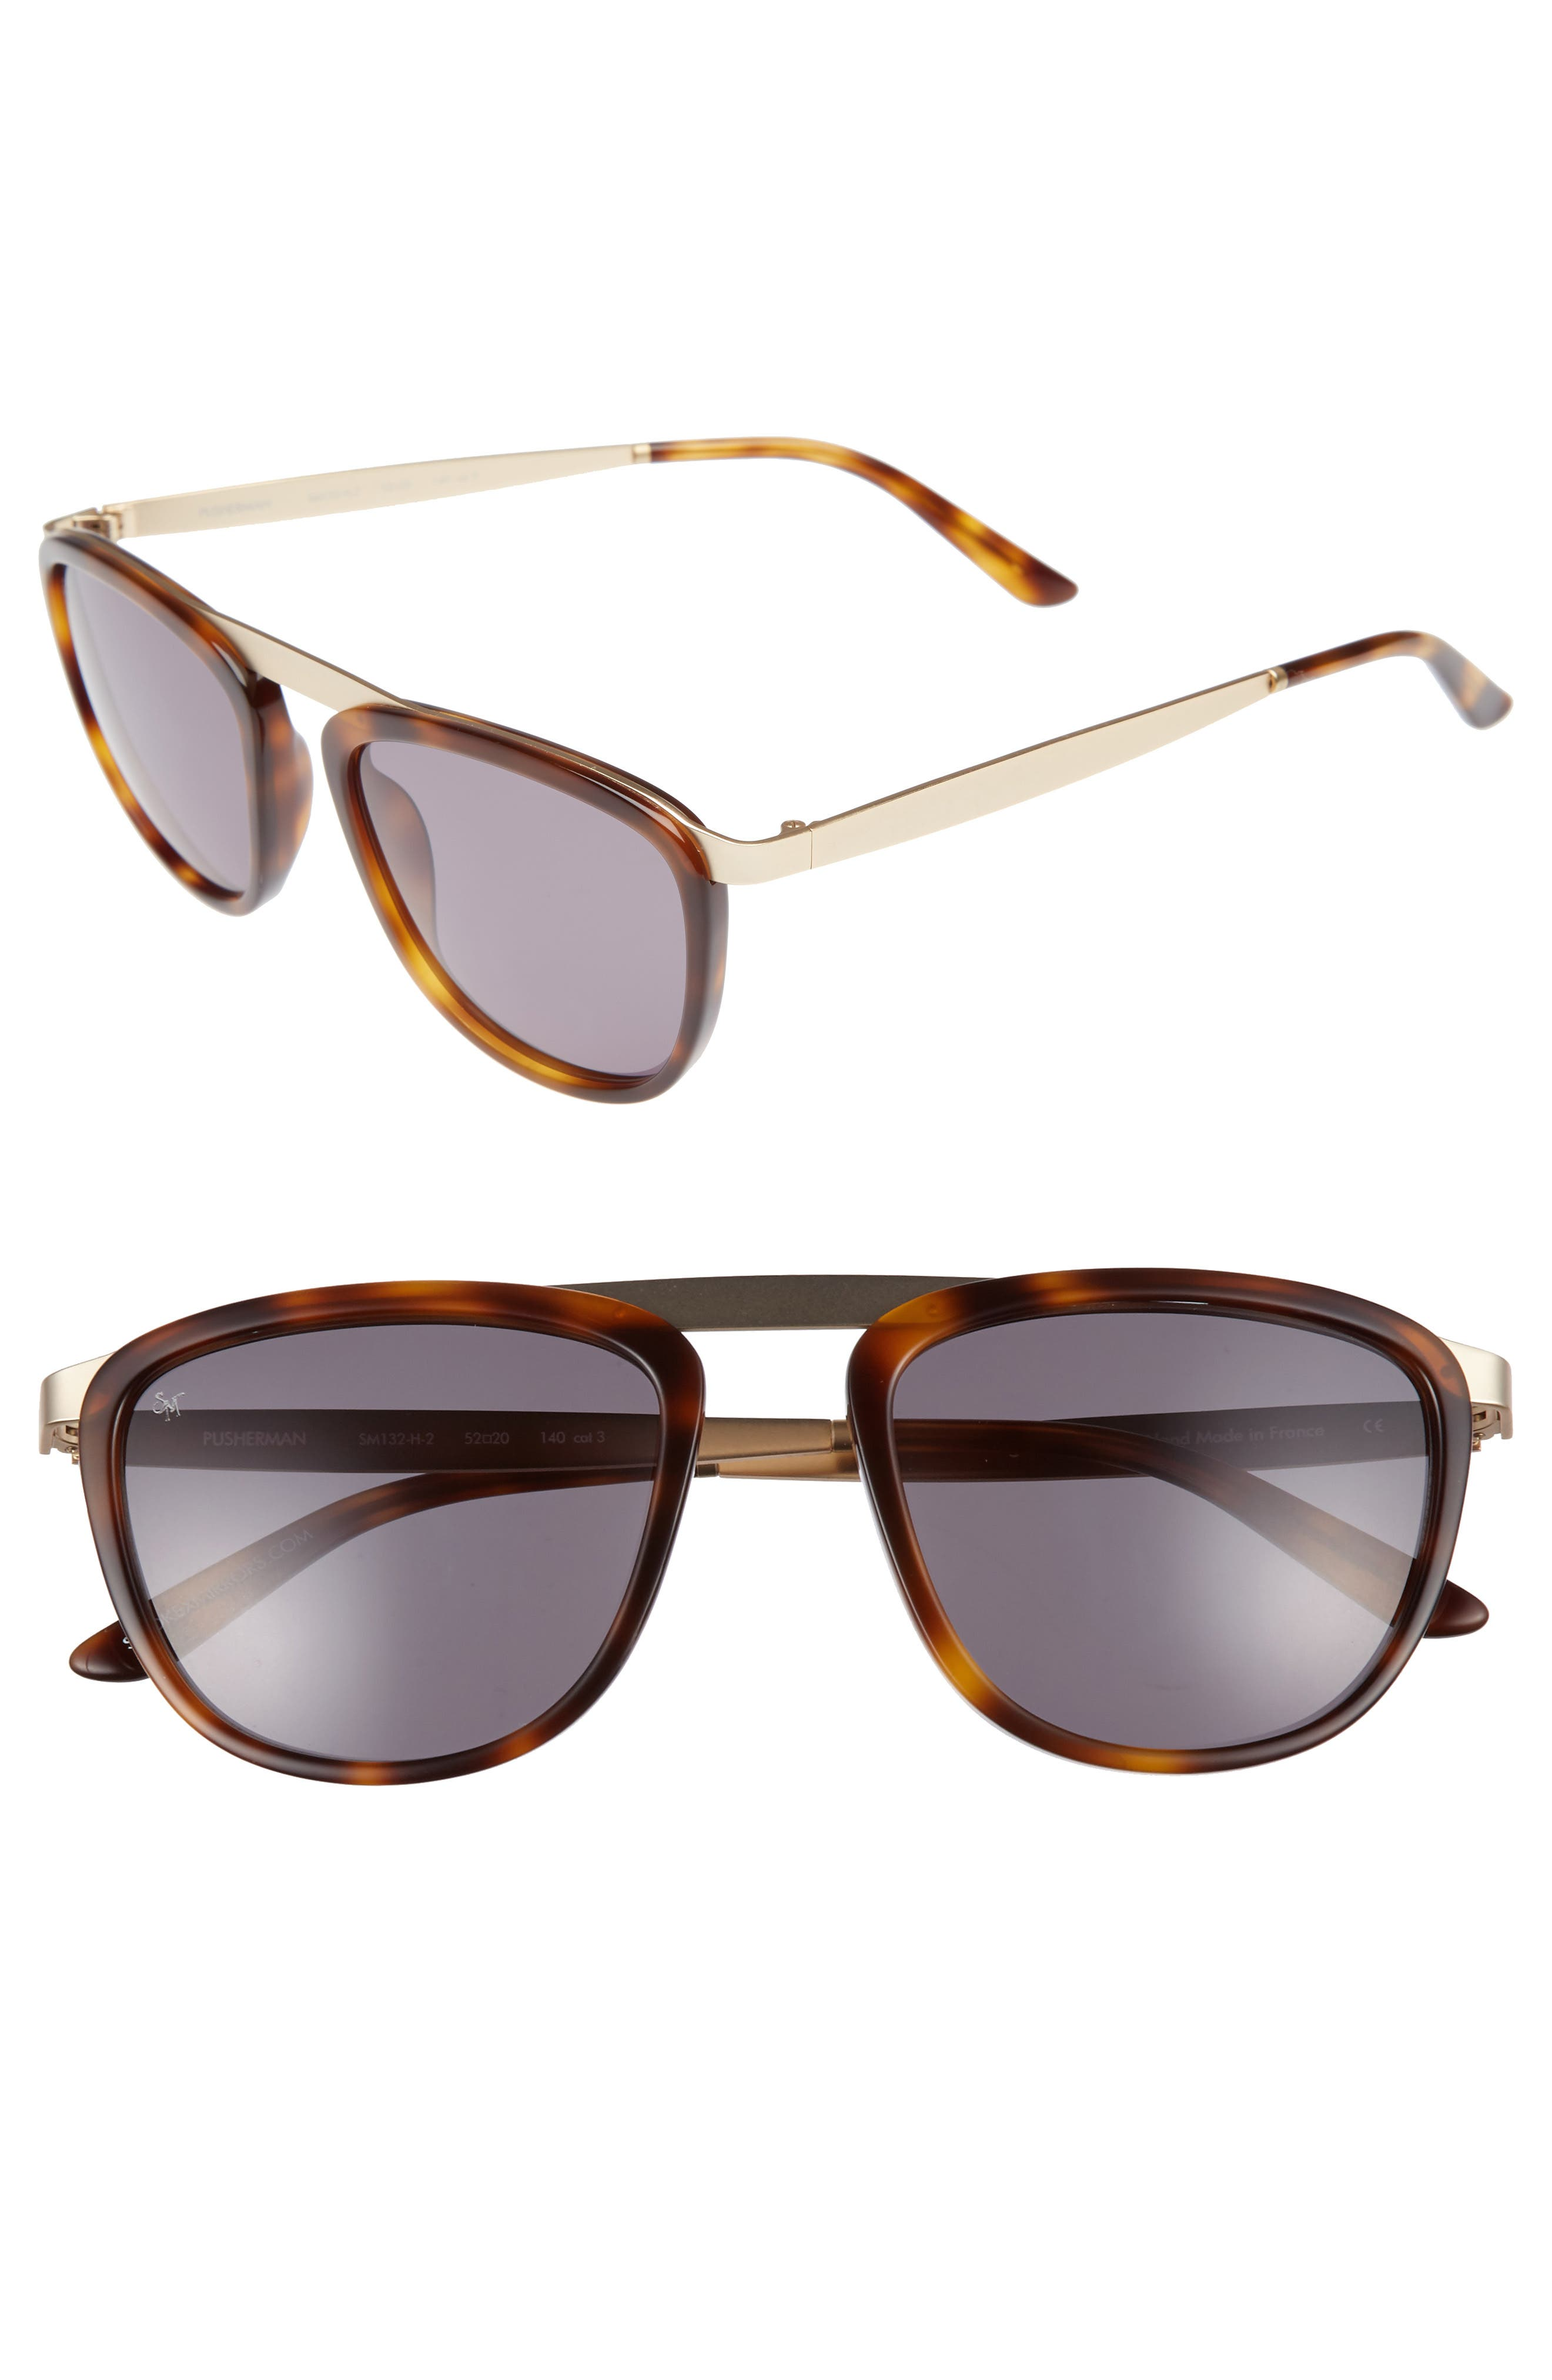 Pusherman 52mm Retro Sunglasses,                         Main,                         color, Tortoise- Matte Gold/ Green